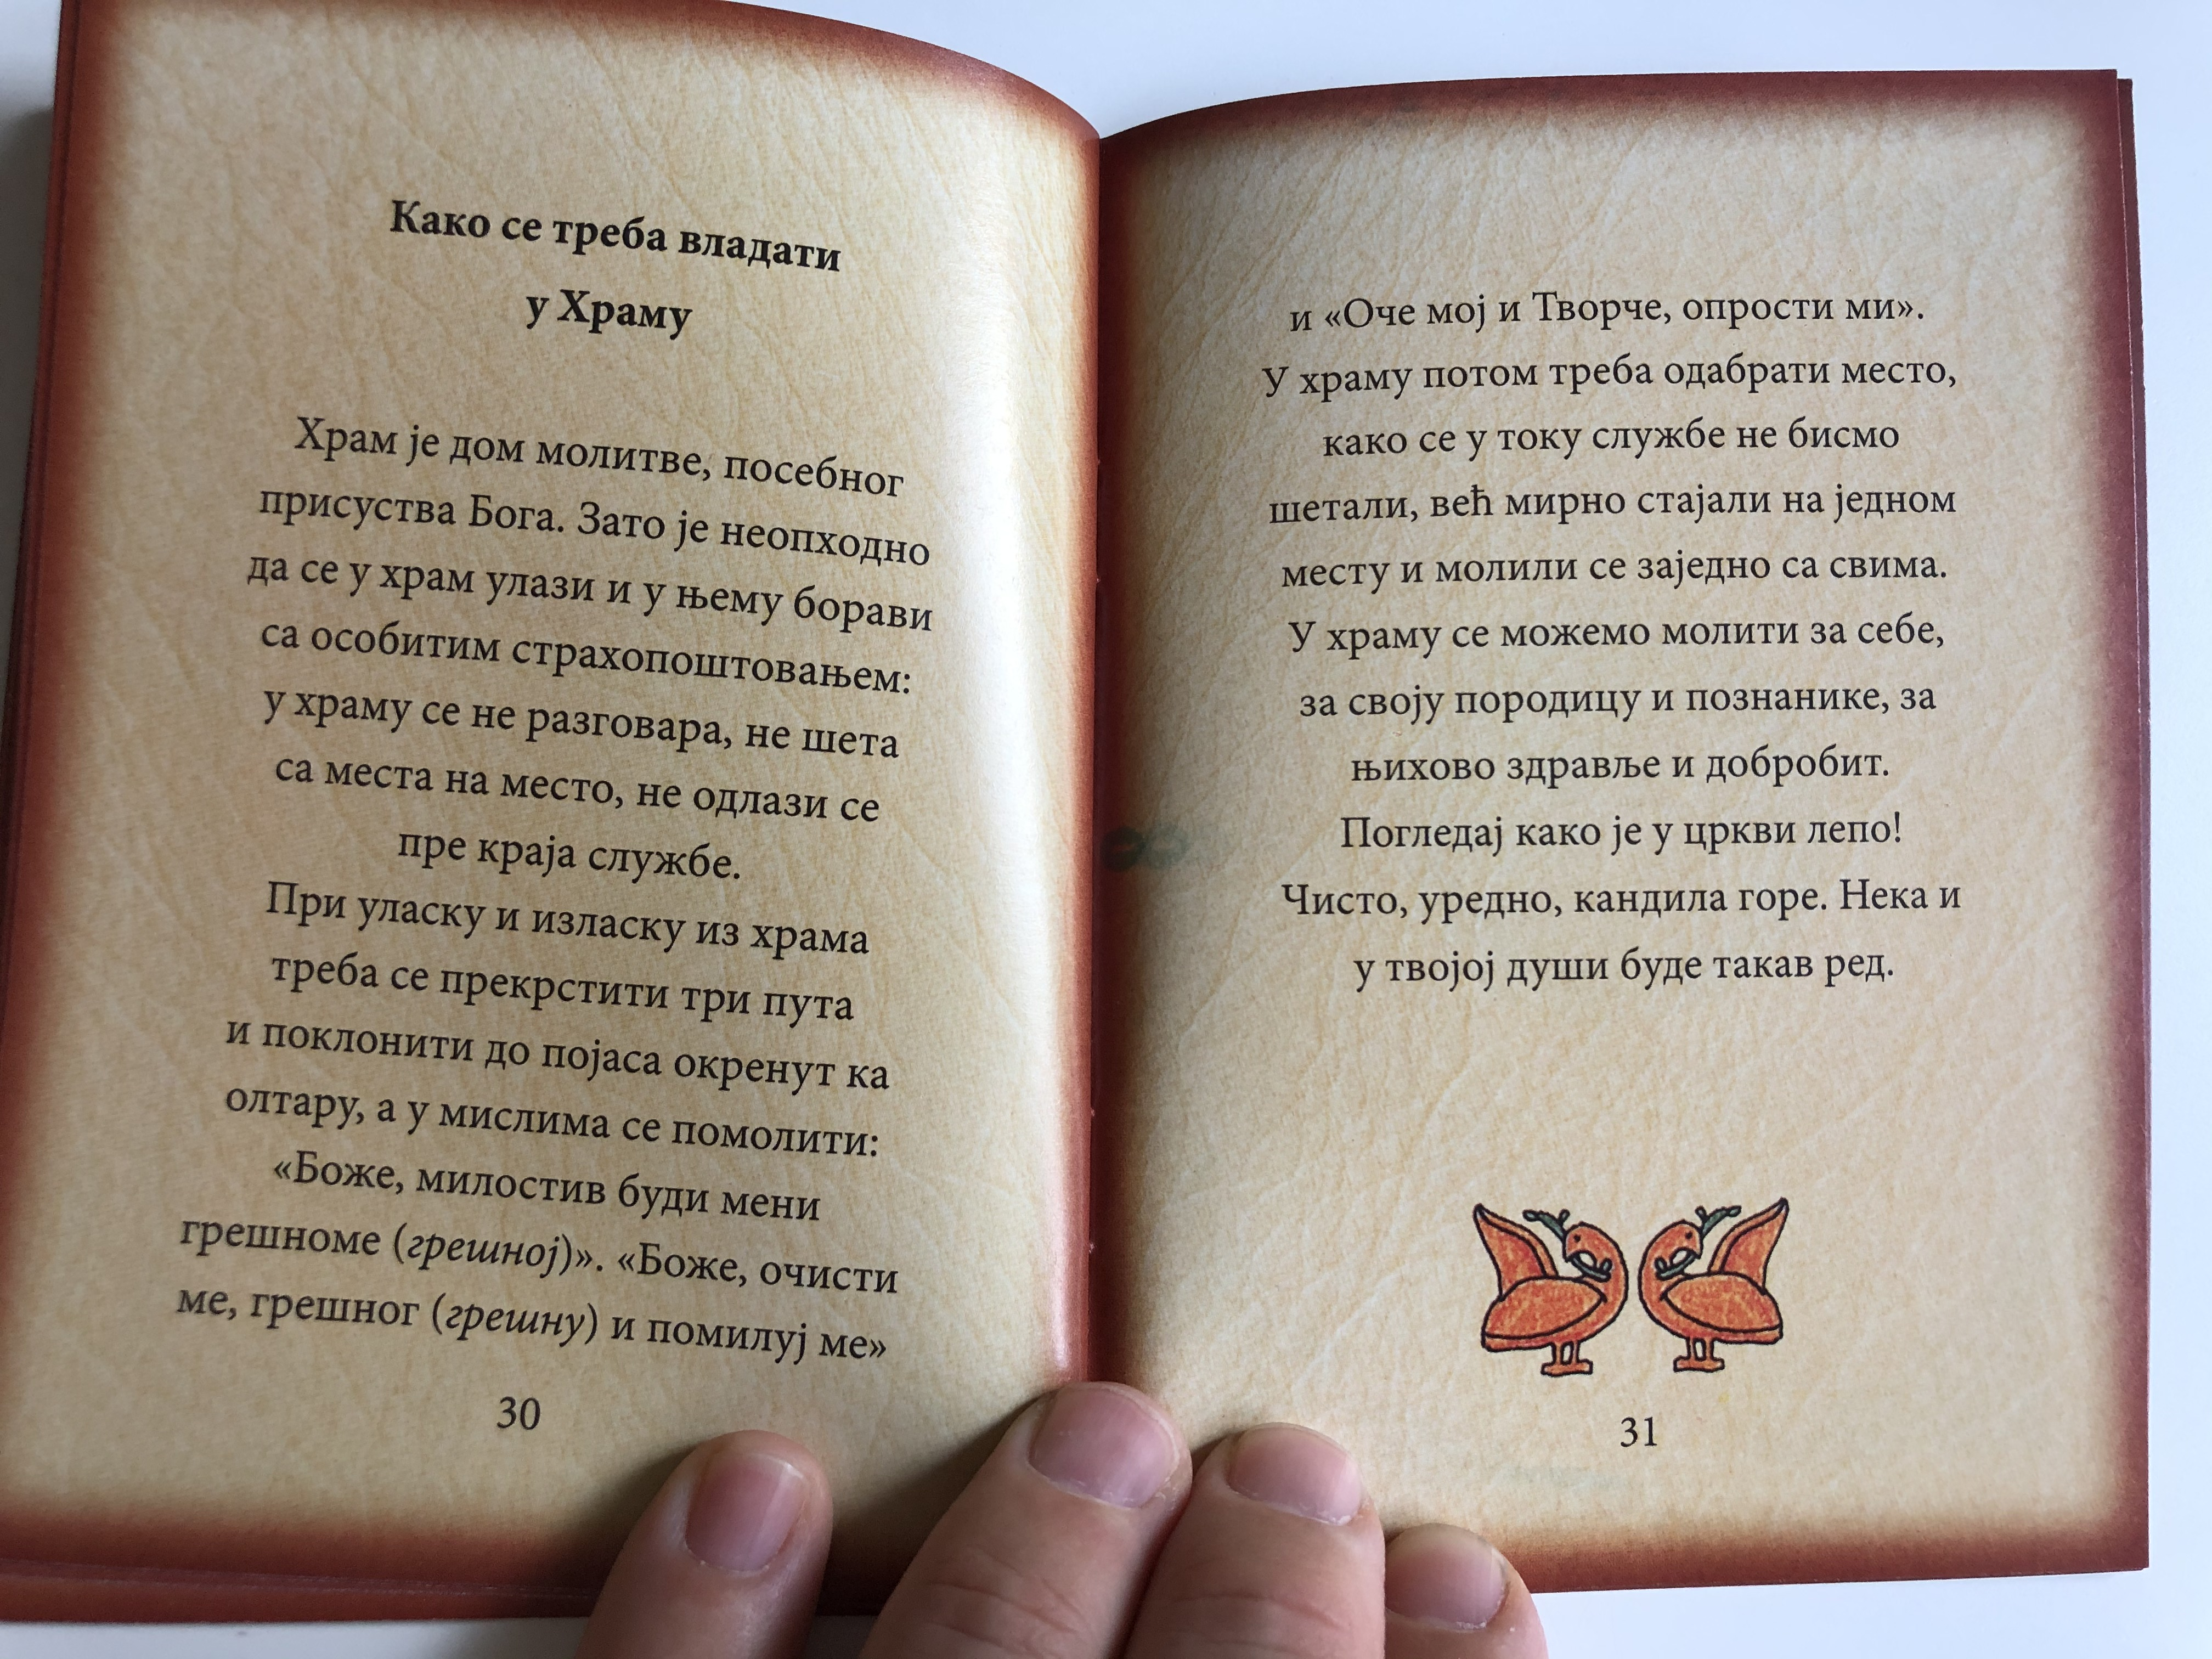 -serbian-orthodox-children-s-prayer-booklet-9.jpg